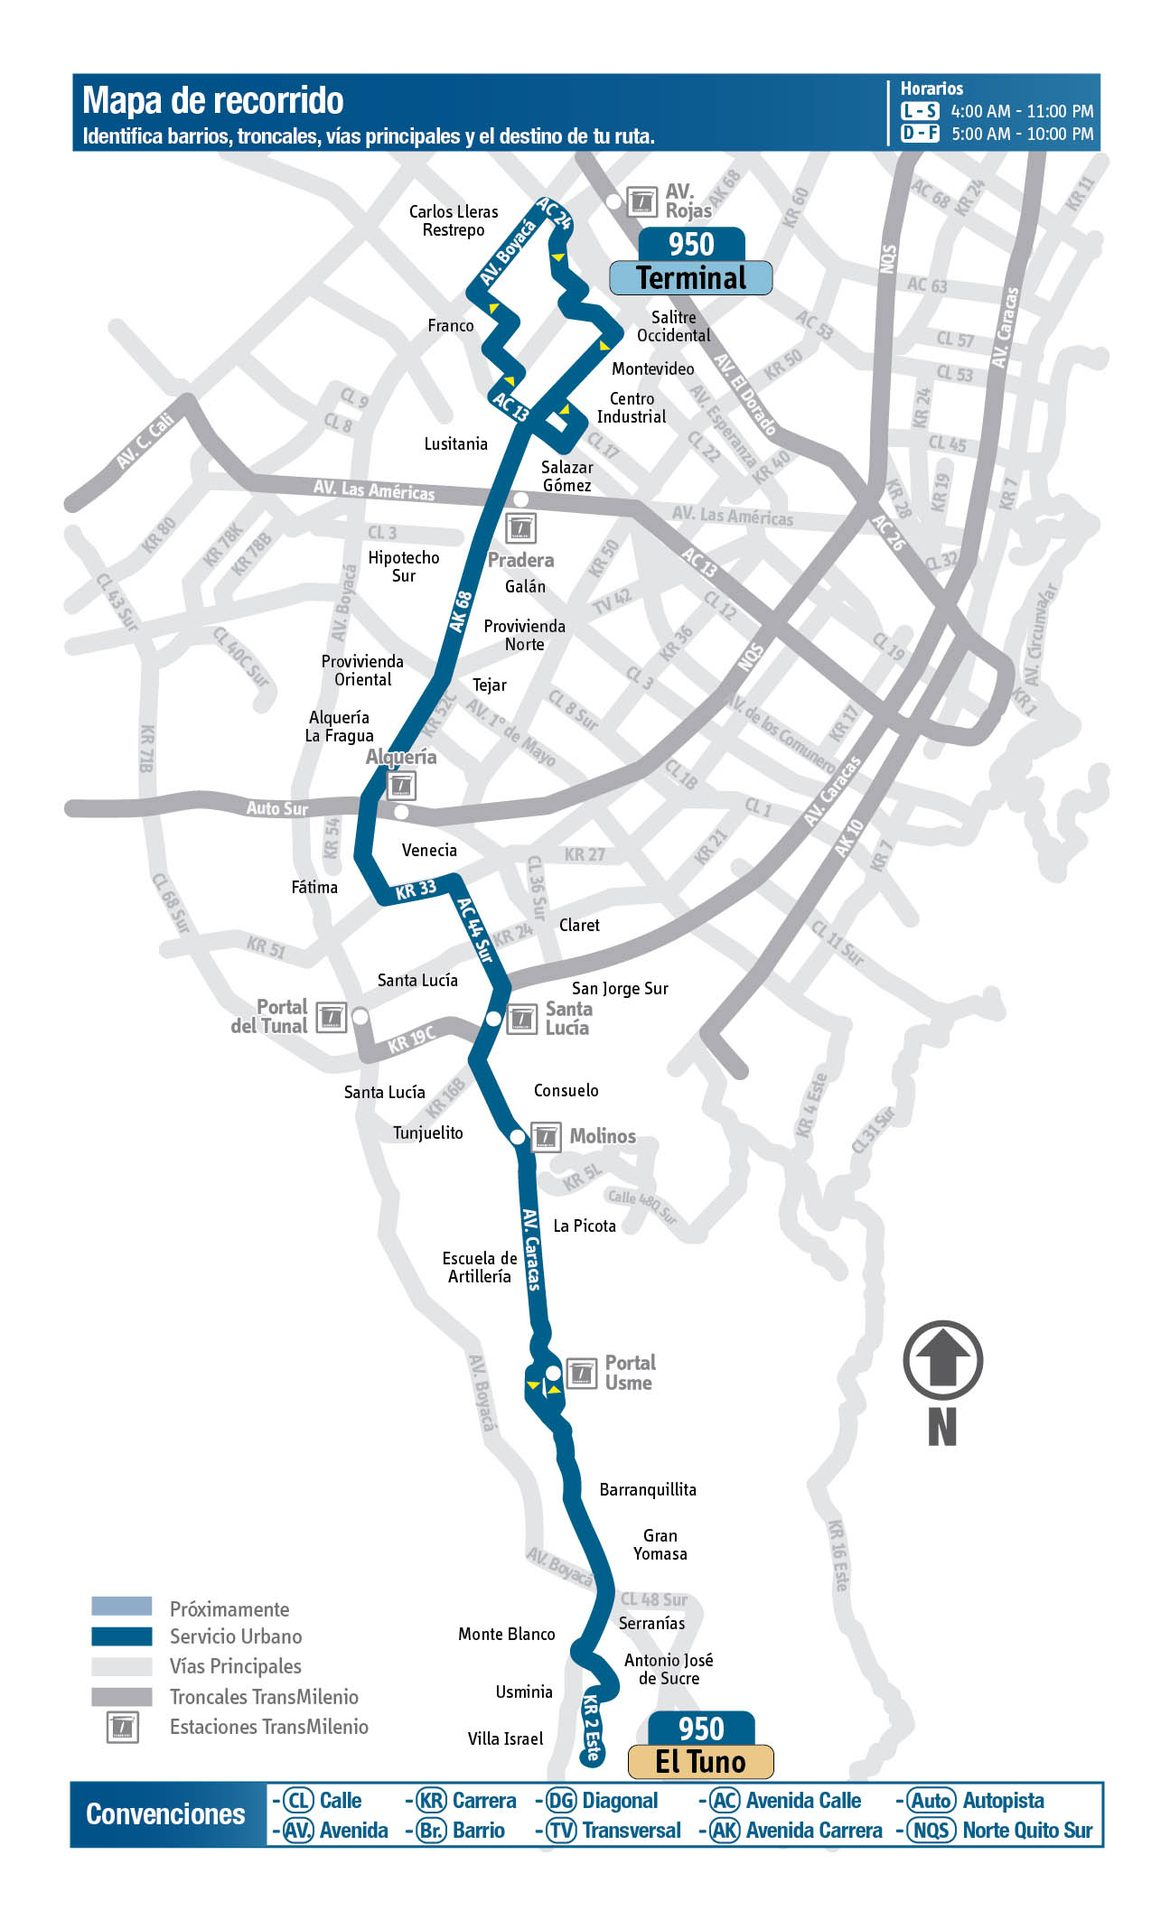 Ruta SITP: 950 El Tuno ↔ Terminal (Recortada hasta Venecia) [Urbana] 3